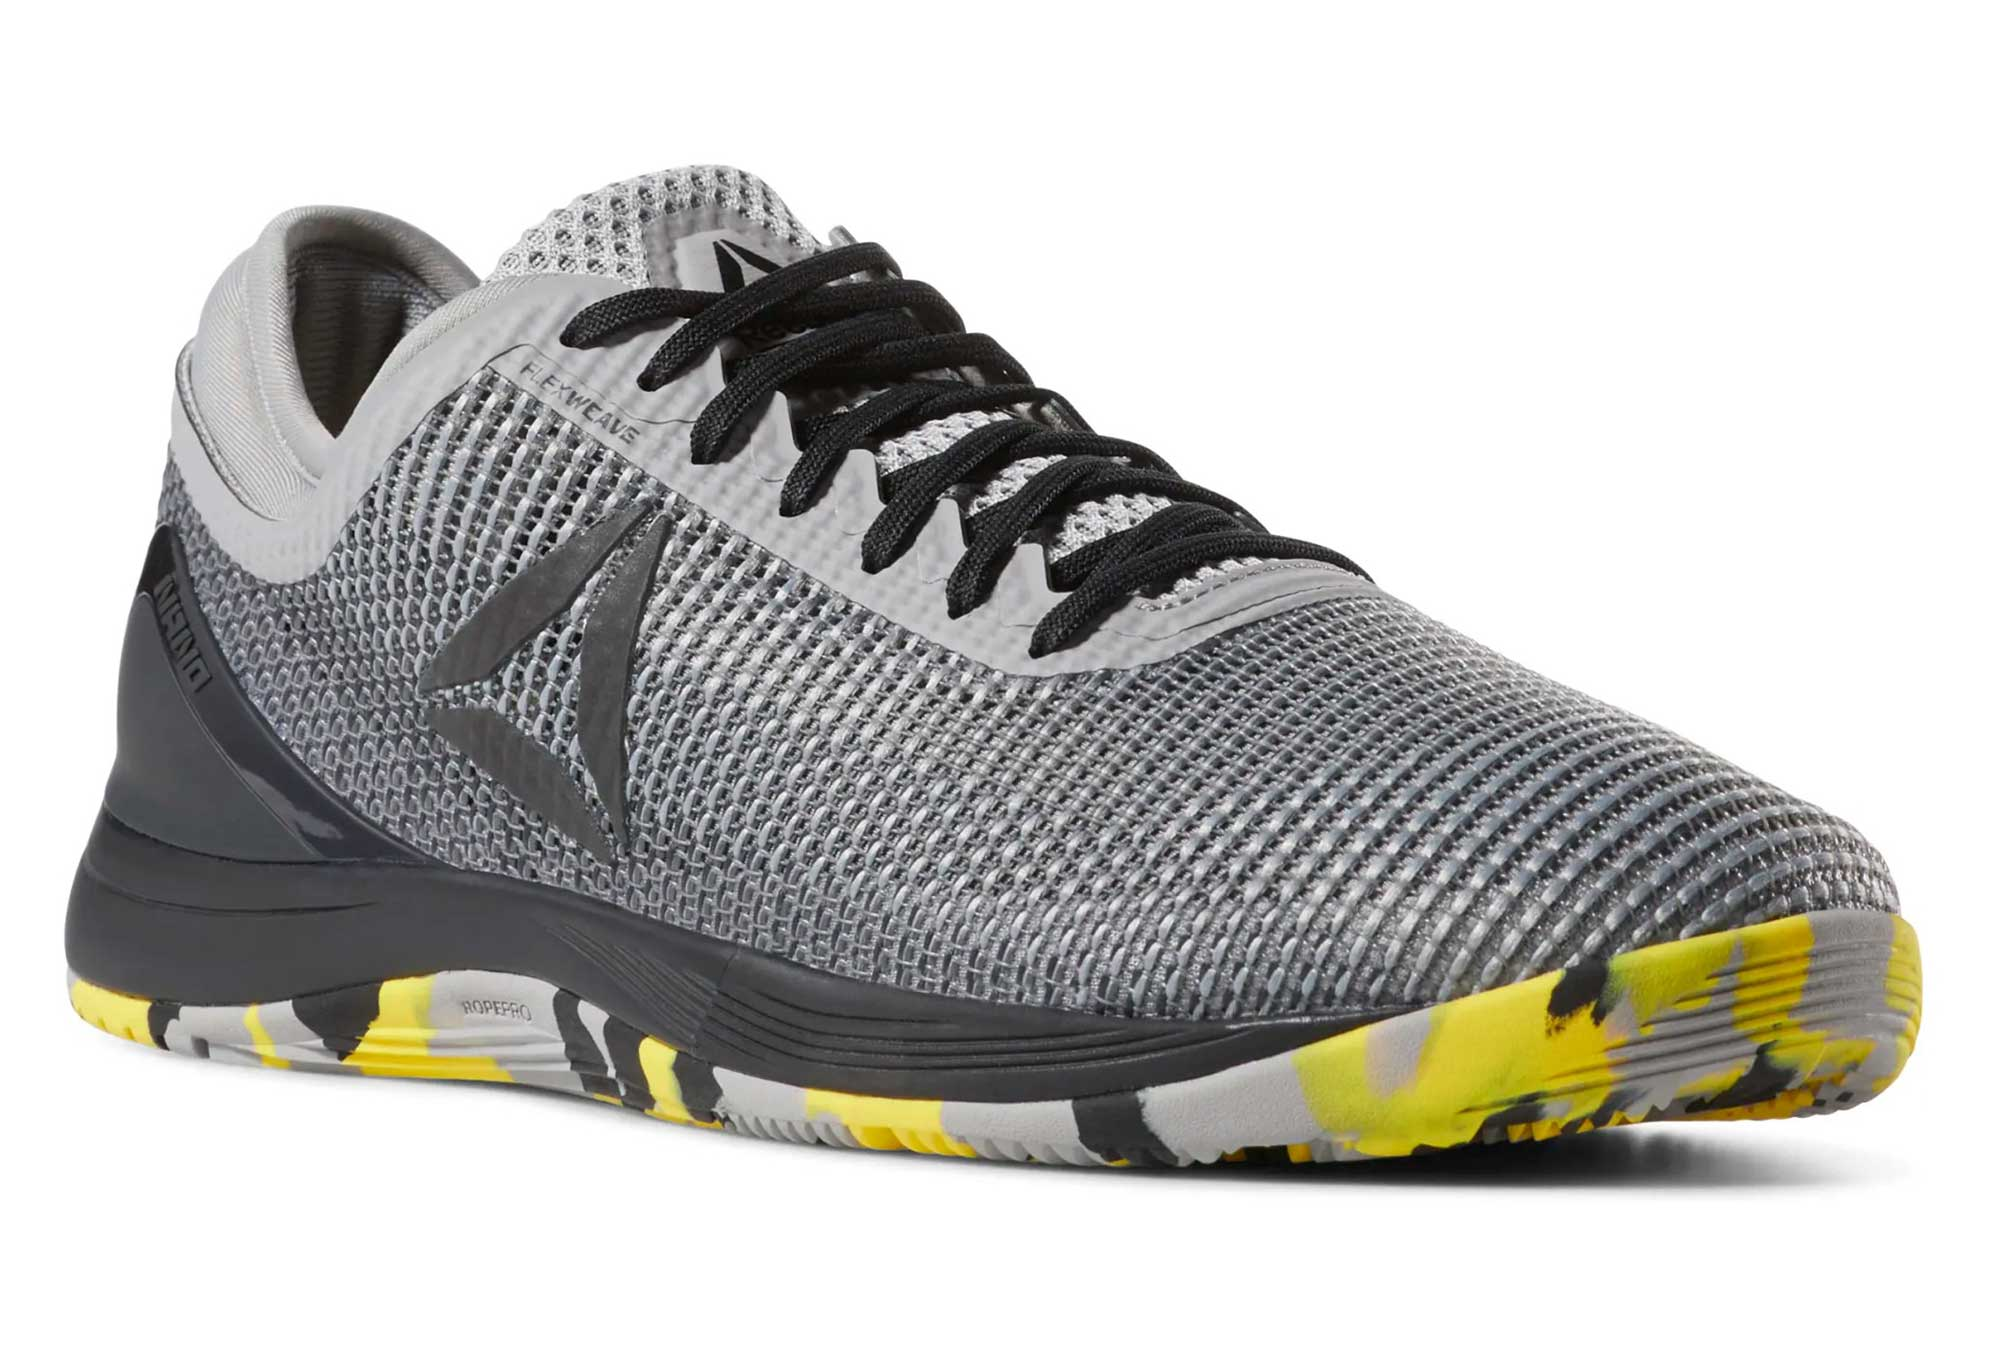 5970239d12 Reebok CrossFit Nano 8 Flexweave Grey Black Yellow